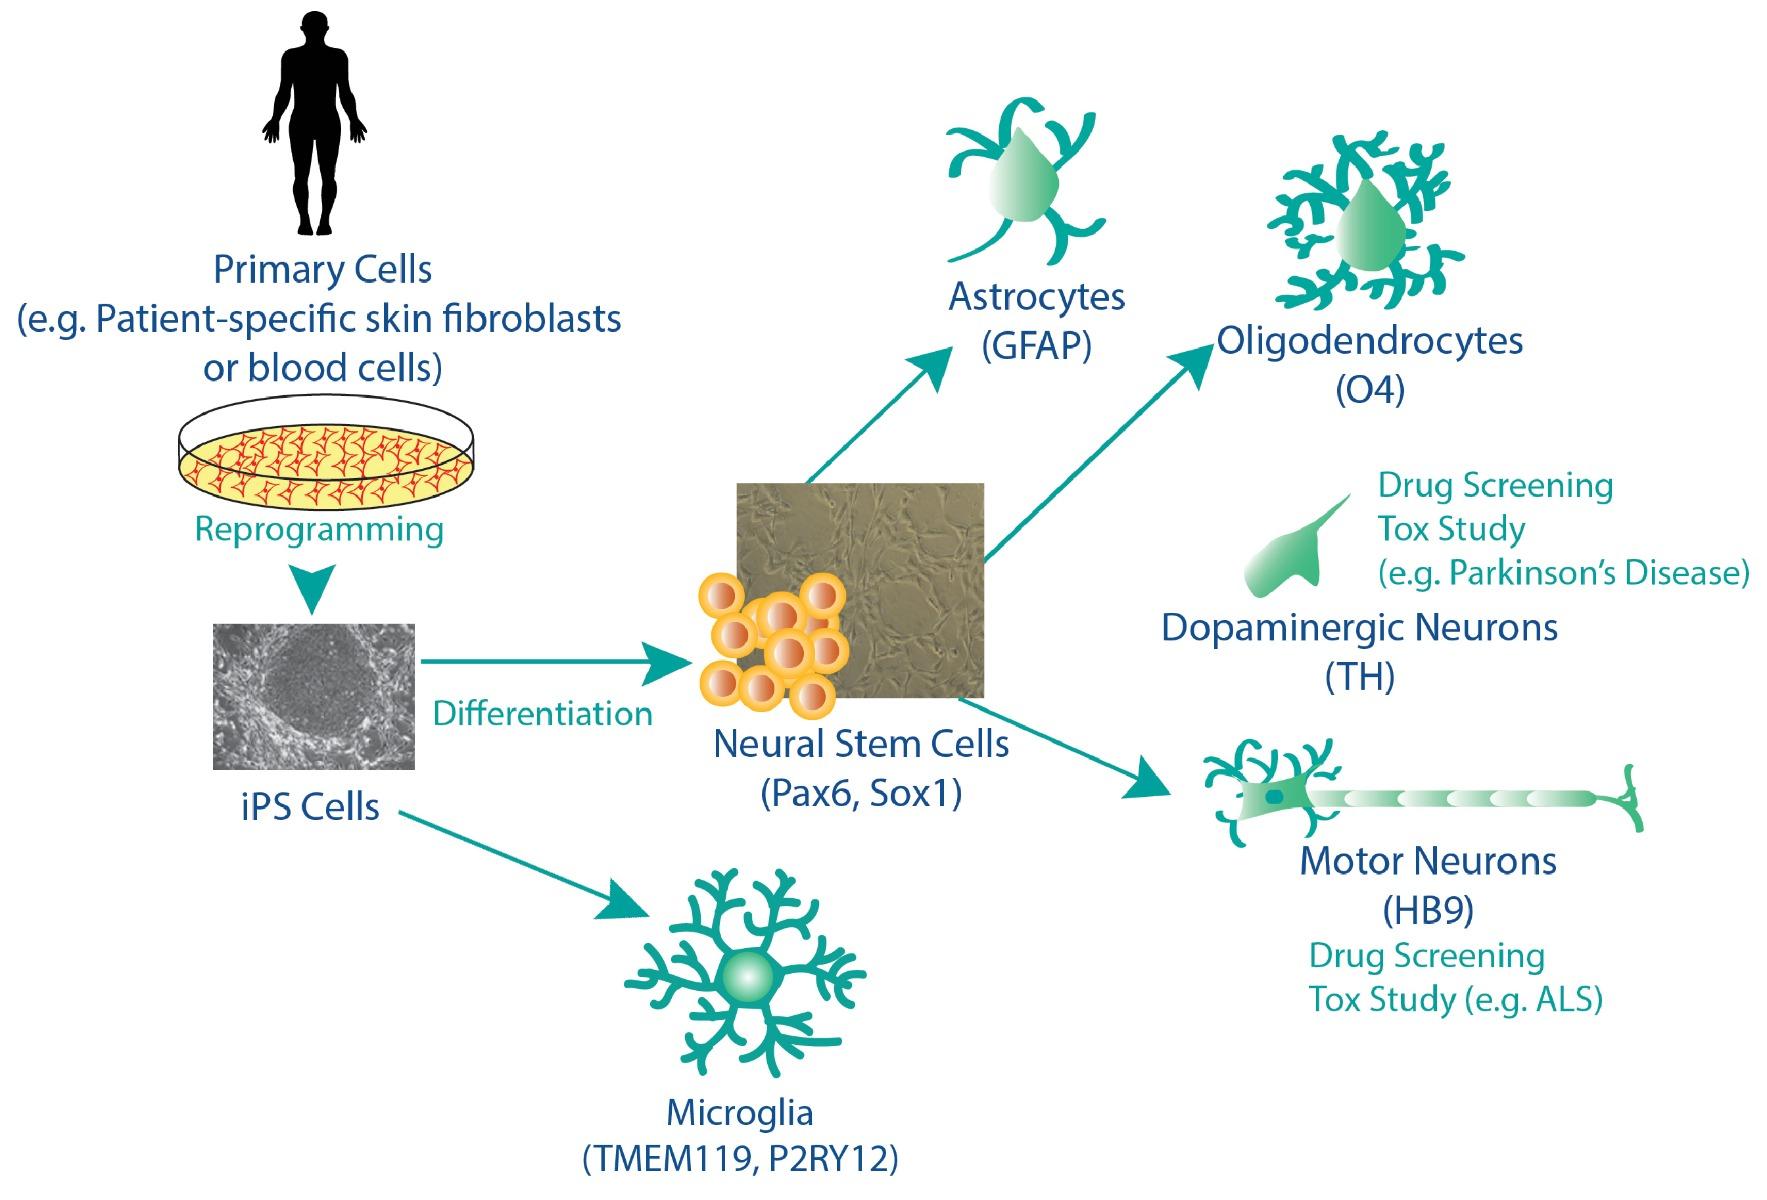 schematic-isogenic-microglia-nsc-astrocytes-neurons